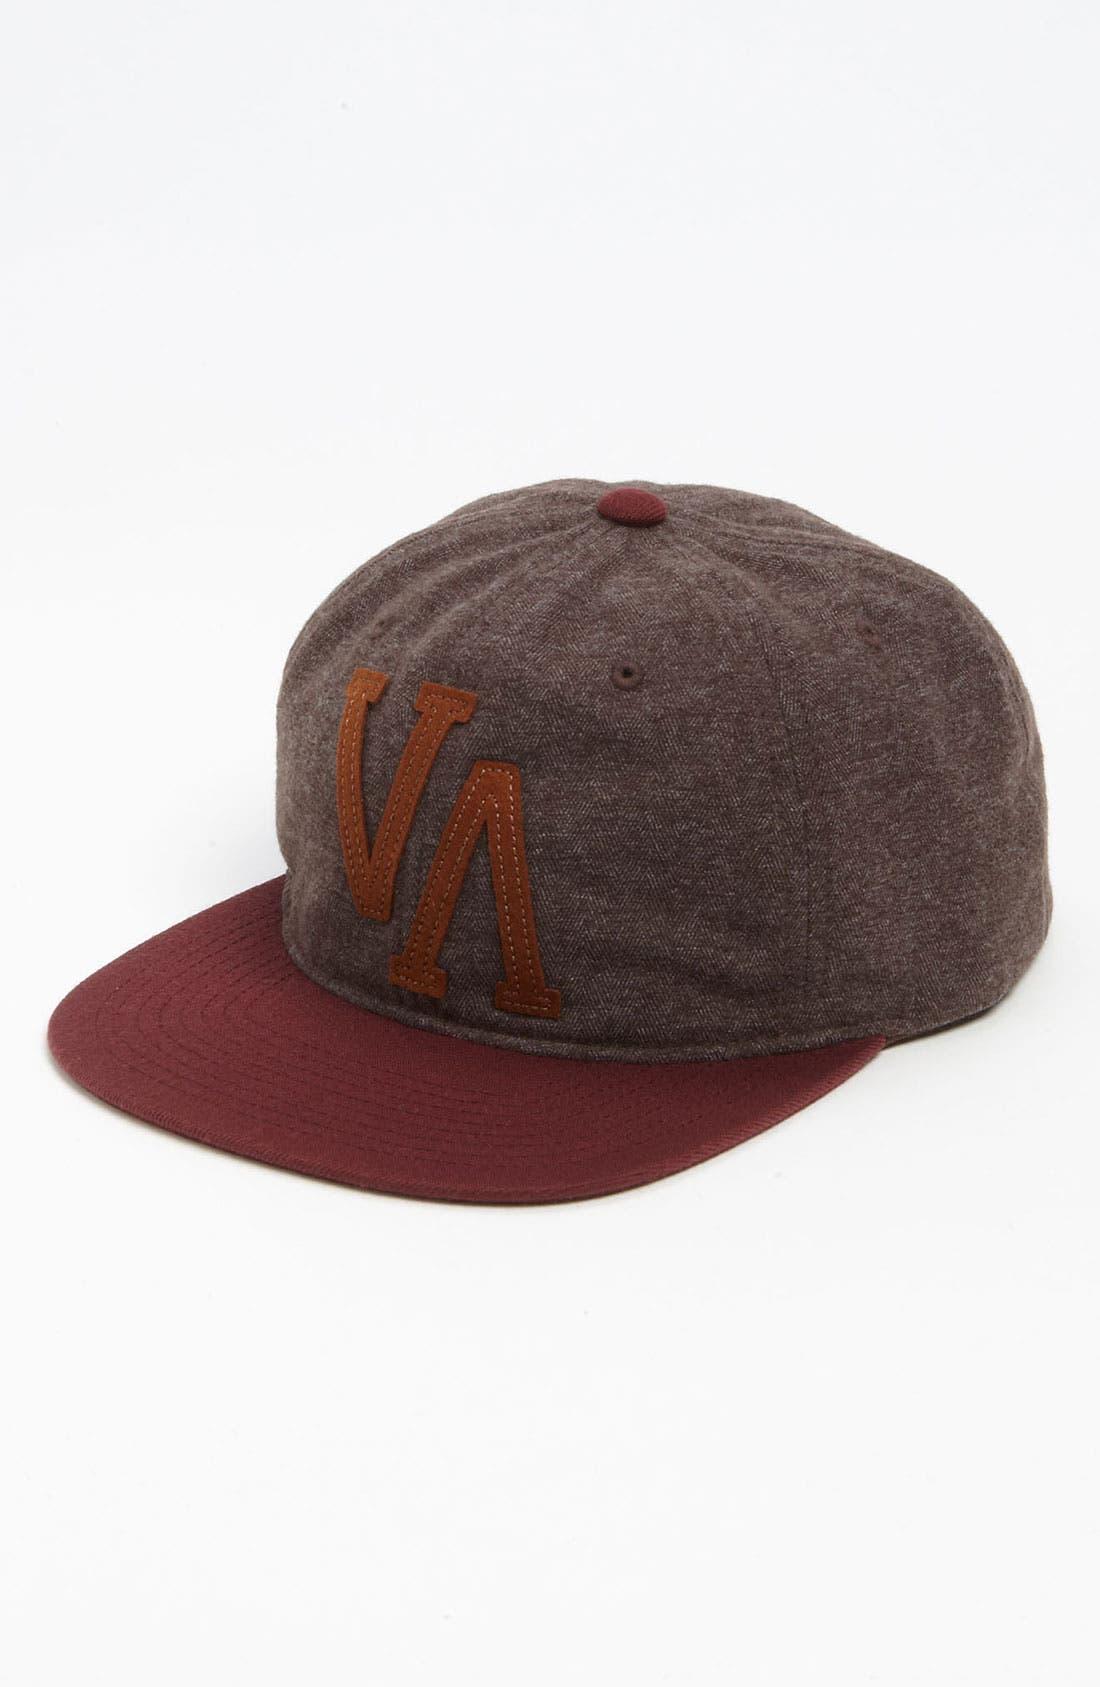 Alternate Image 1 Selected - RVCA 'Old Gold' Snapback Baseball Cap